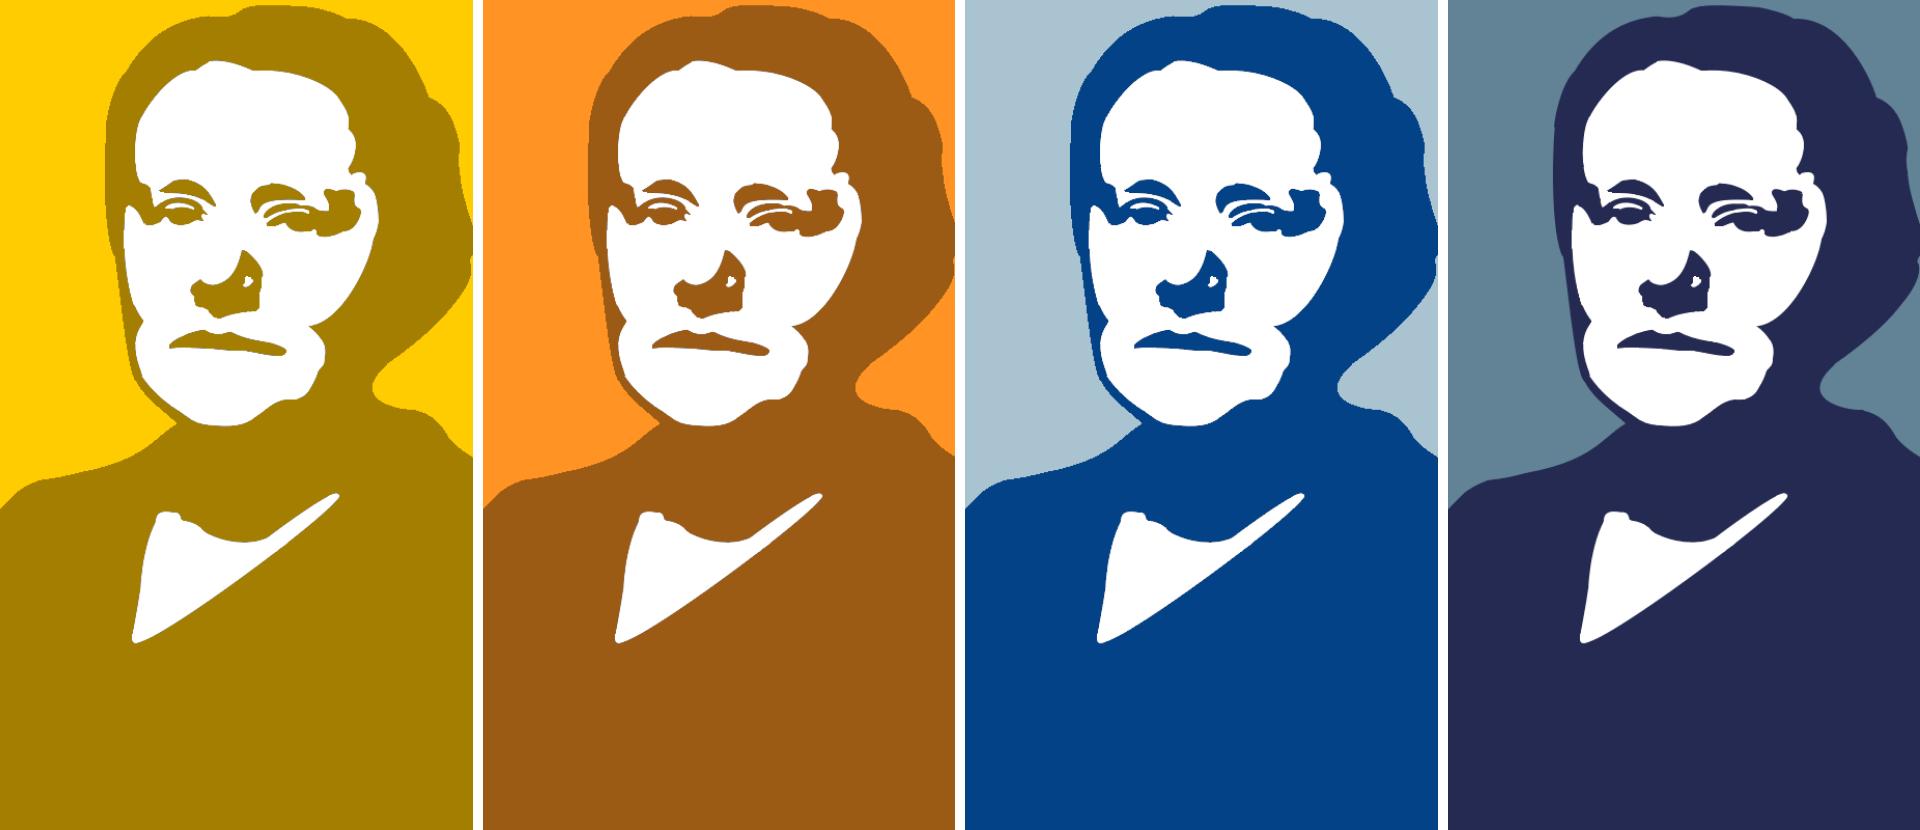 Susan Stebbing | The Philosophers